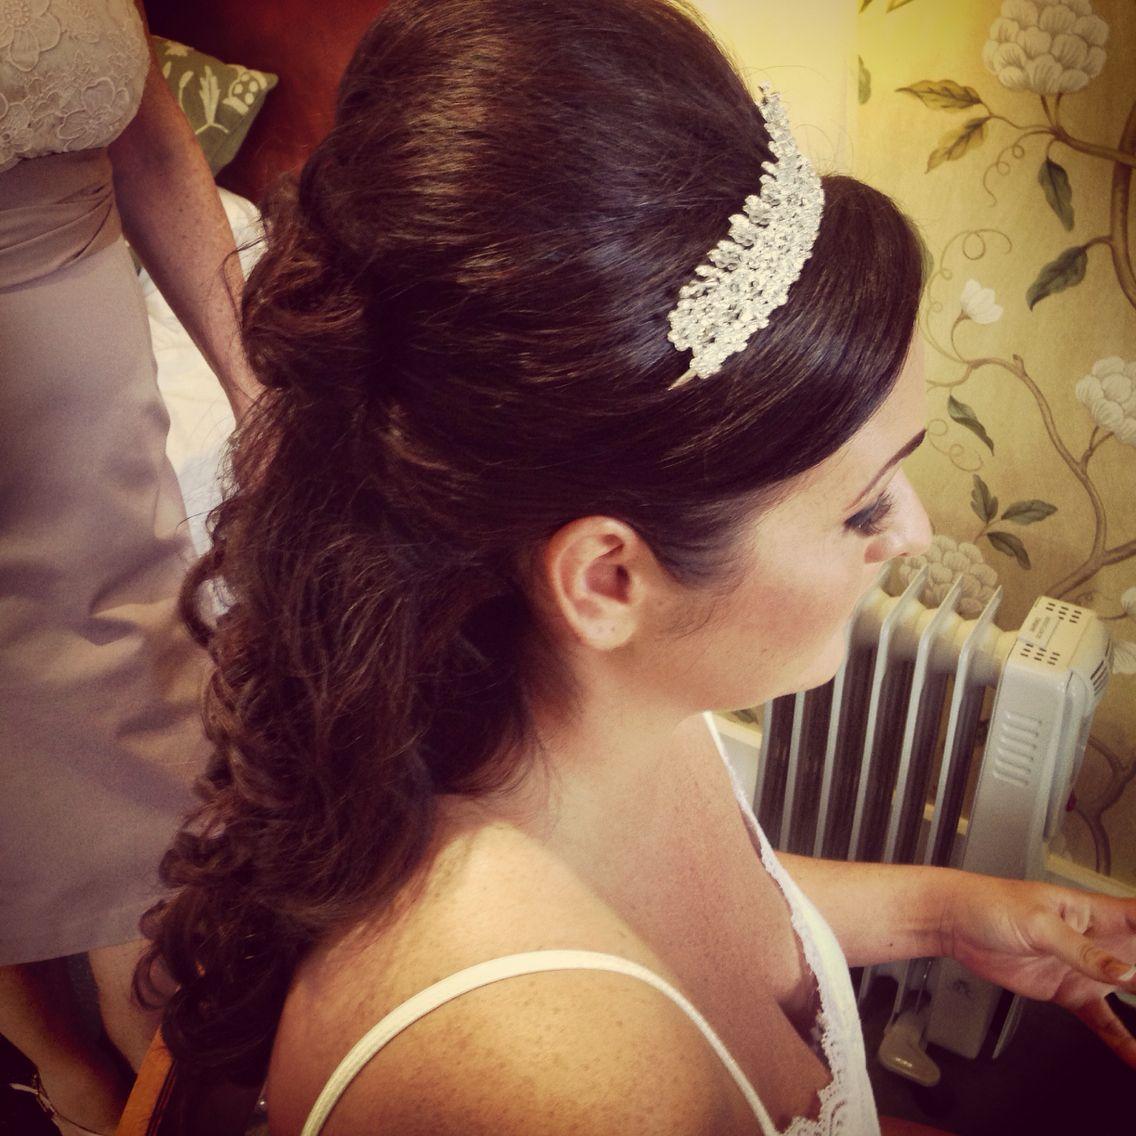 Beehive Hairstyles For Wedding: Princess Hair, Beehive, Half Up Half Down, Extensions